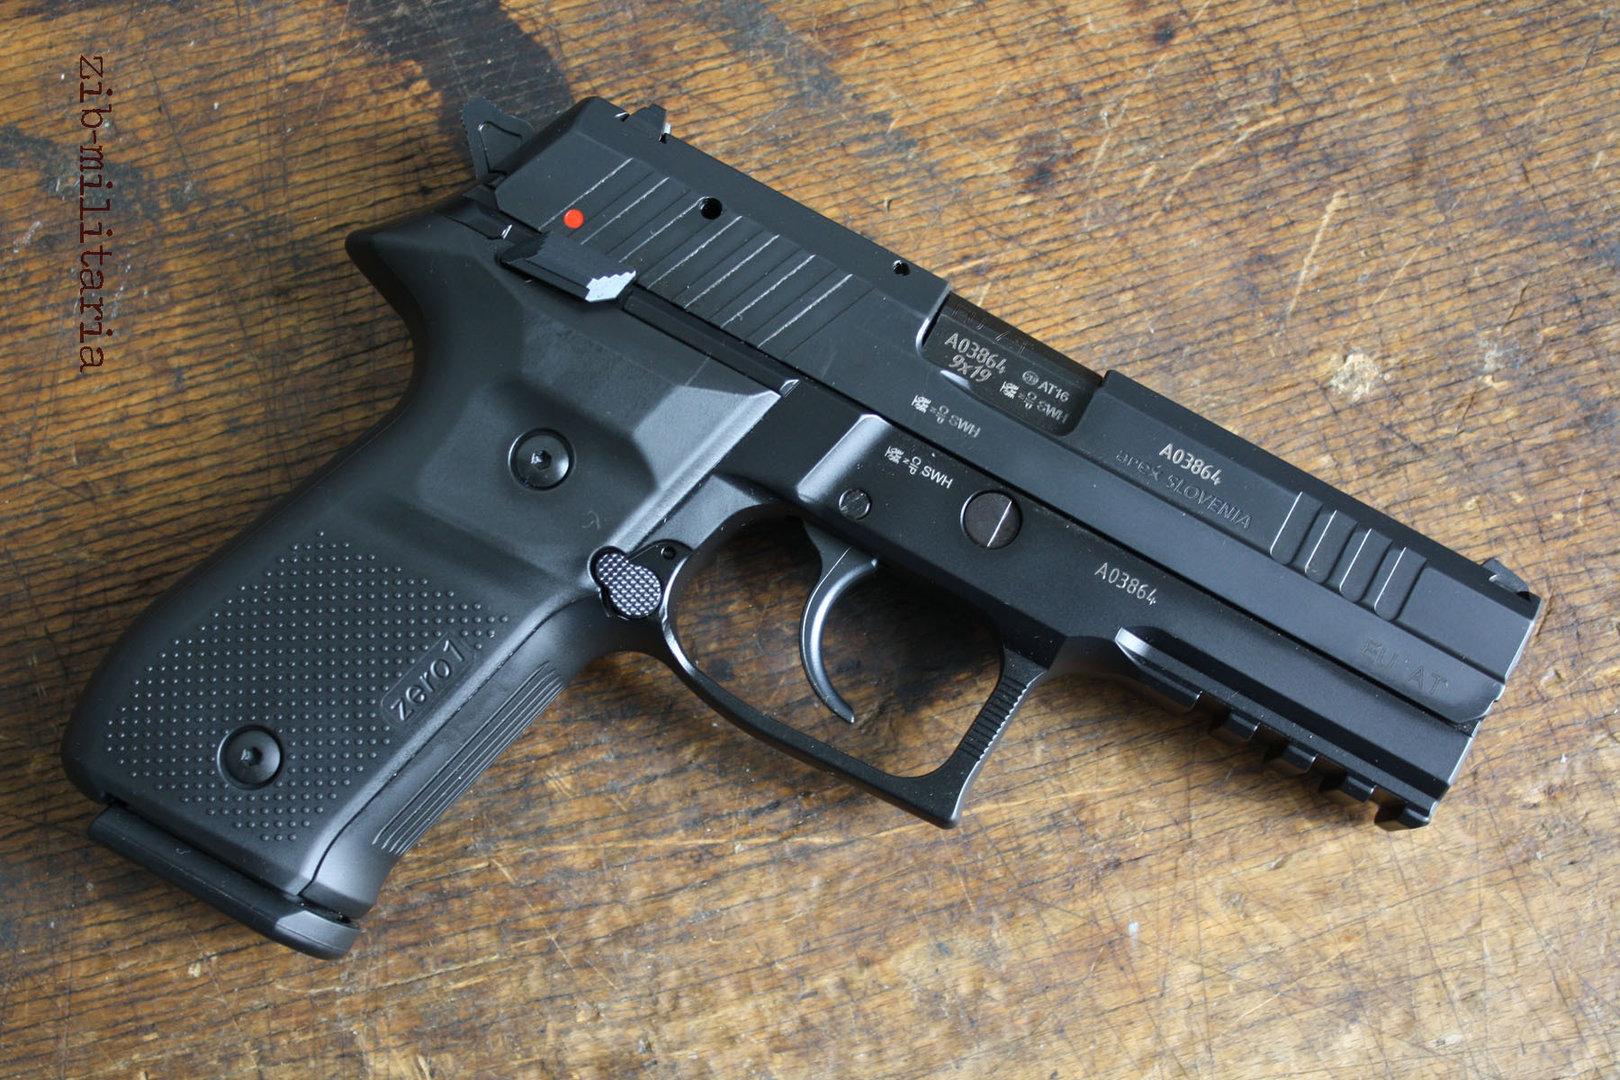 arex rex zero 1 deko pistole deaktivert filmwaffe. Black Bedroom Furniture Sets. Home Design Ideas